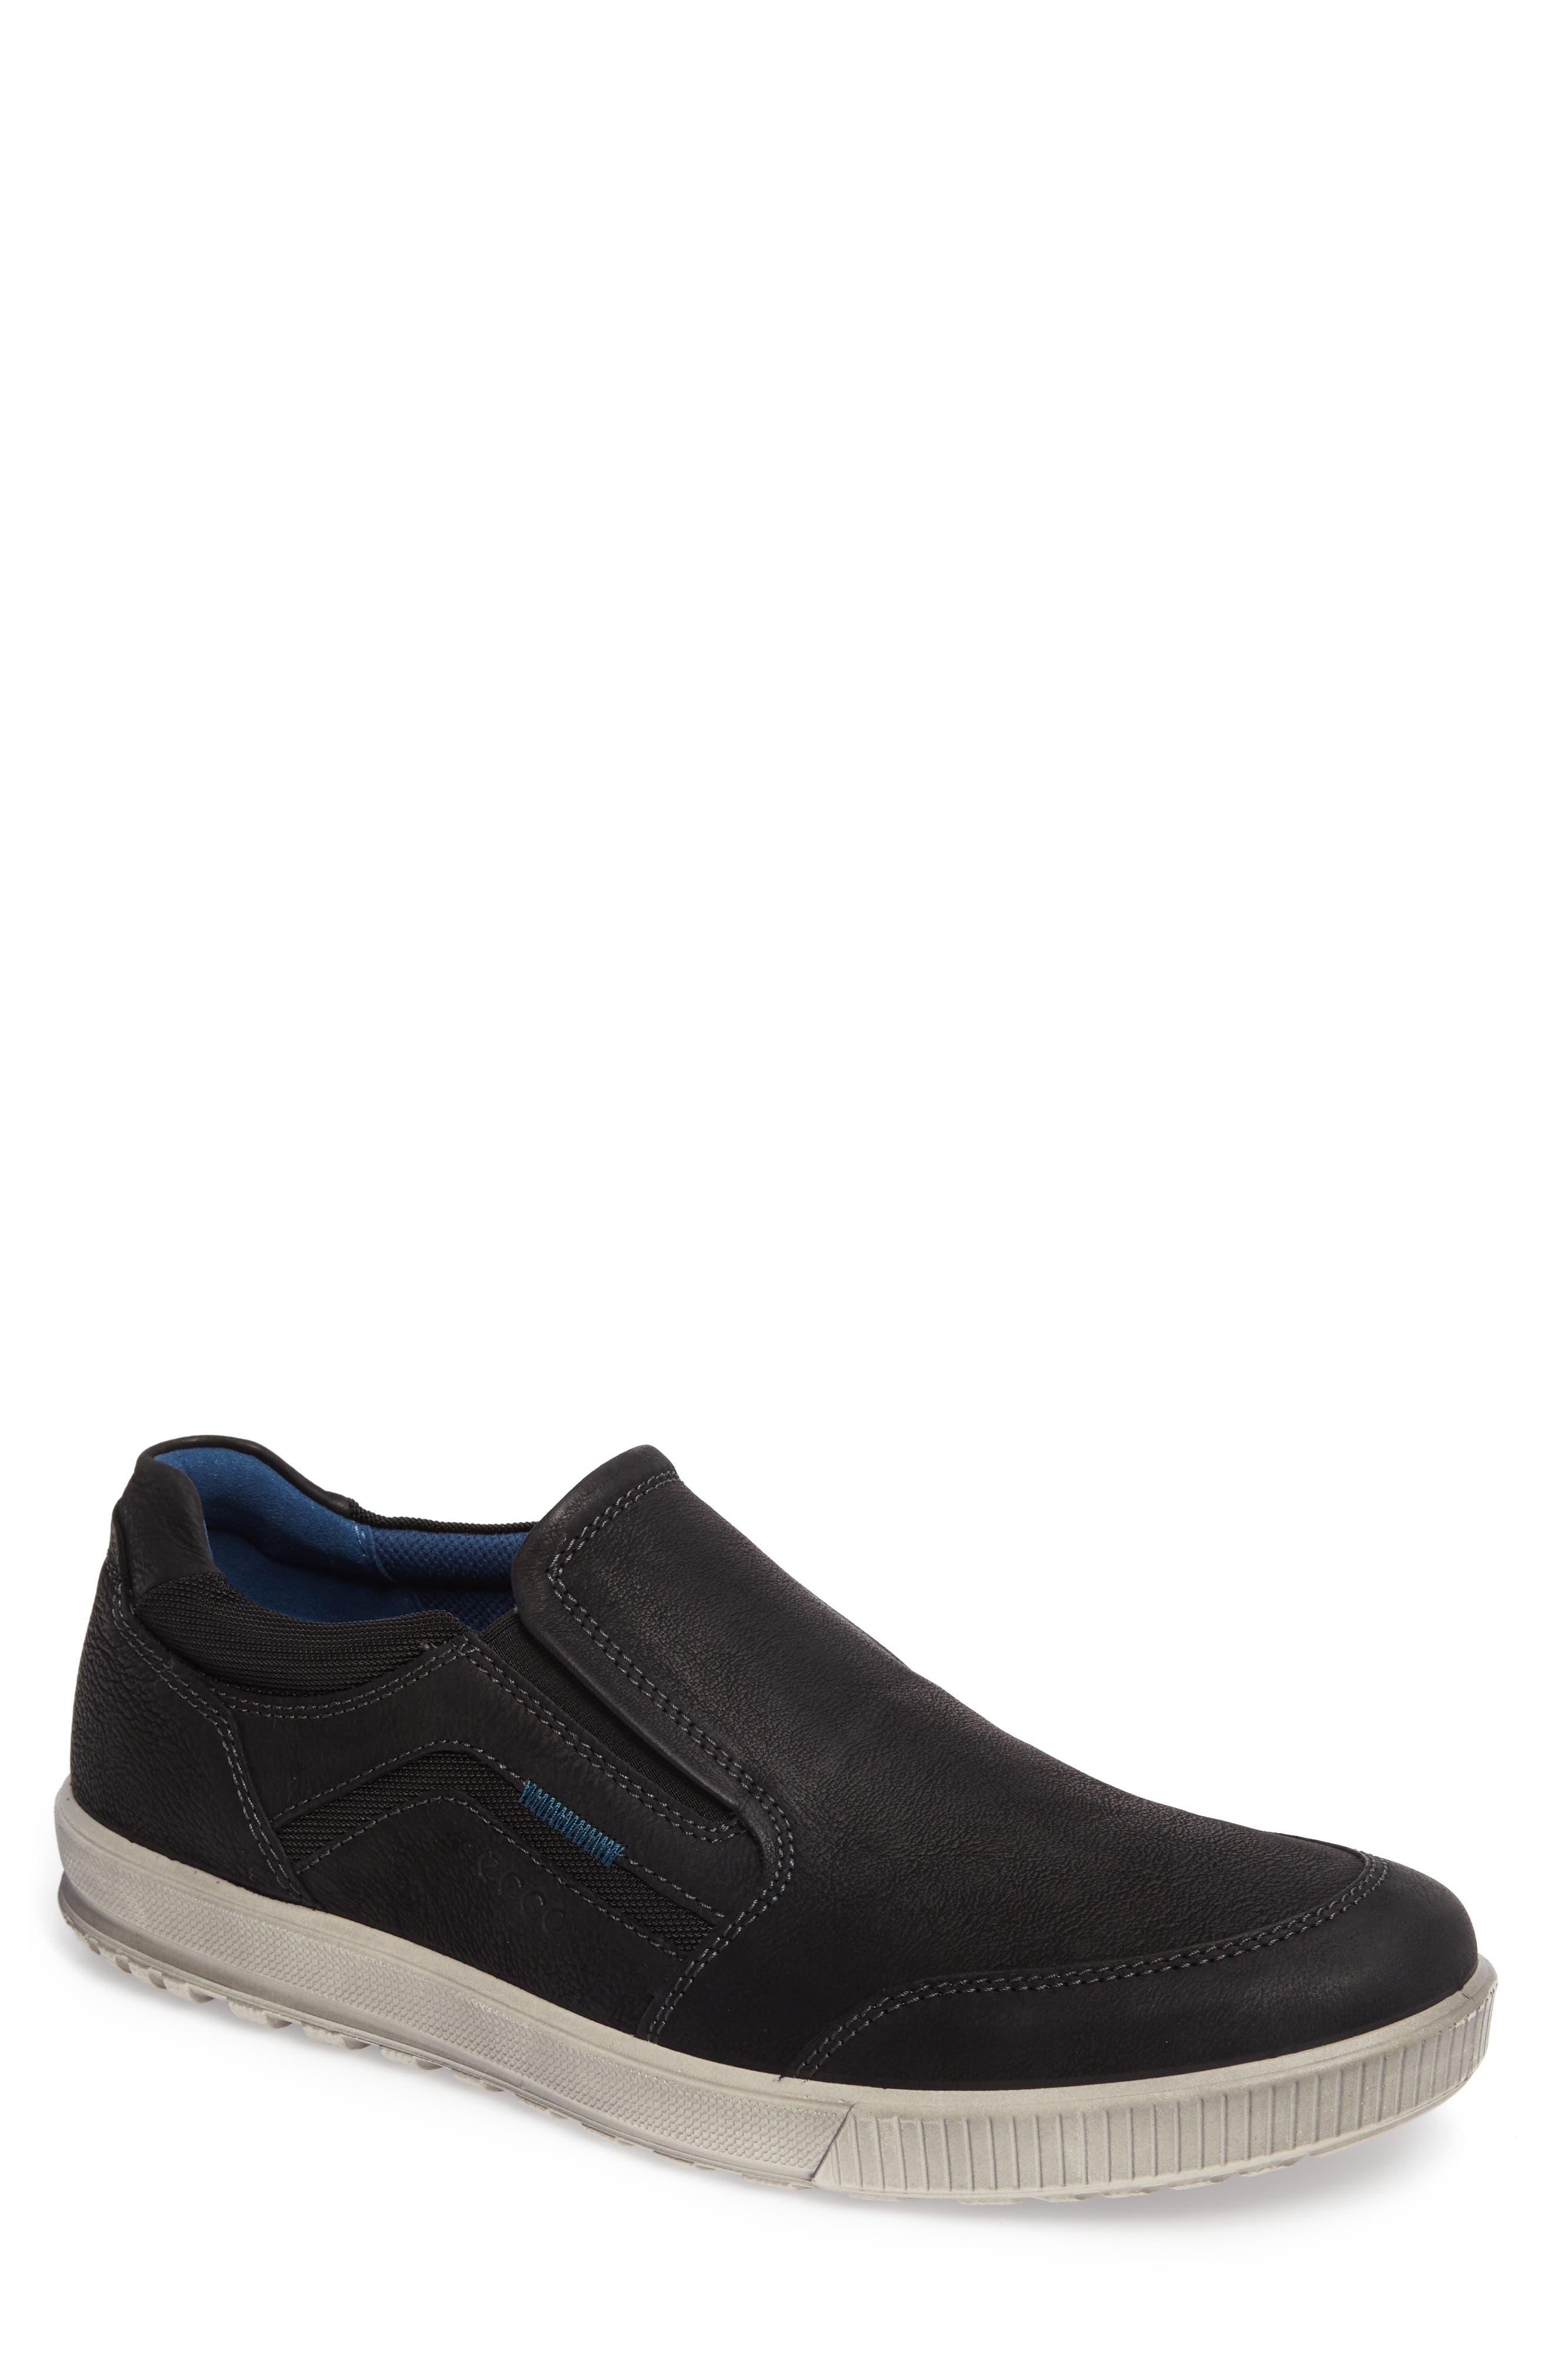 Ennio Slip-On,                         Main,                         color, Black Leather